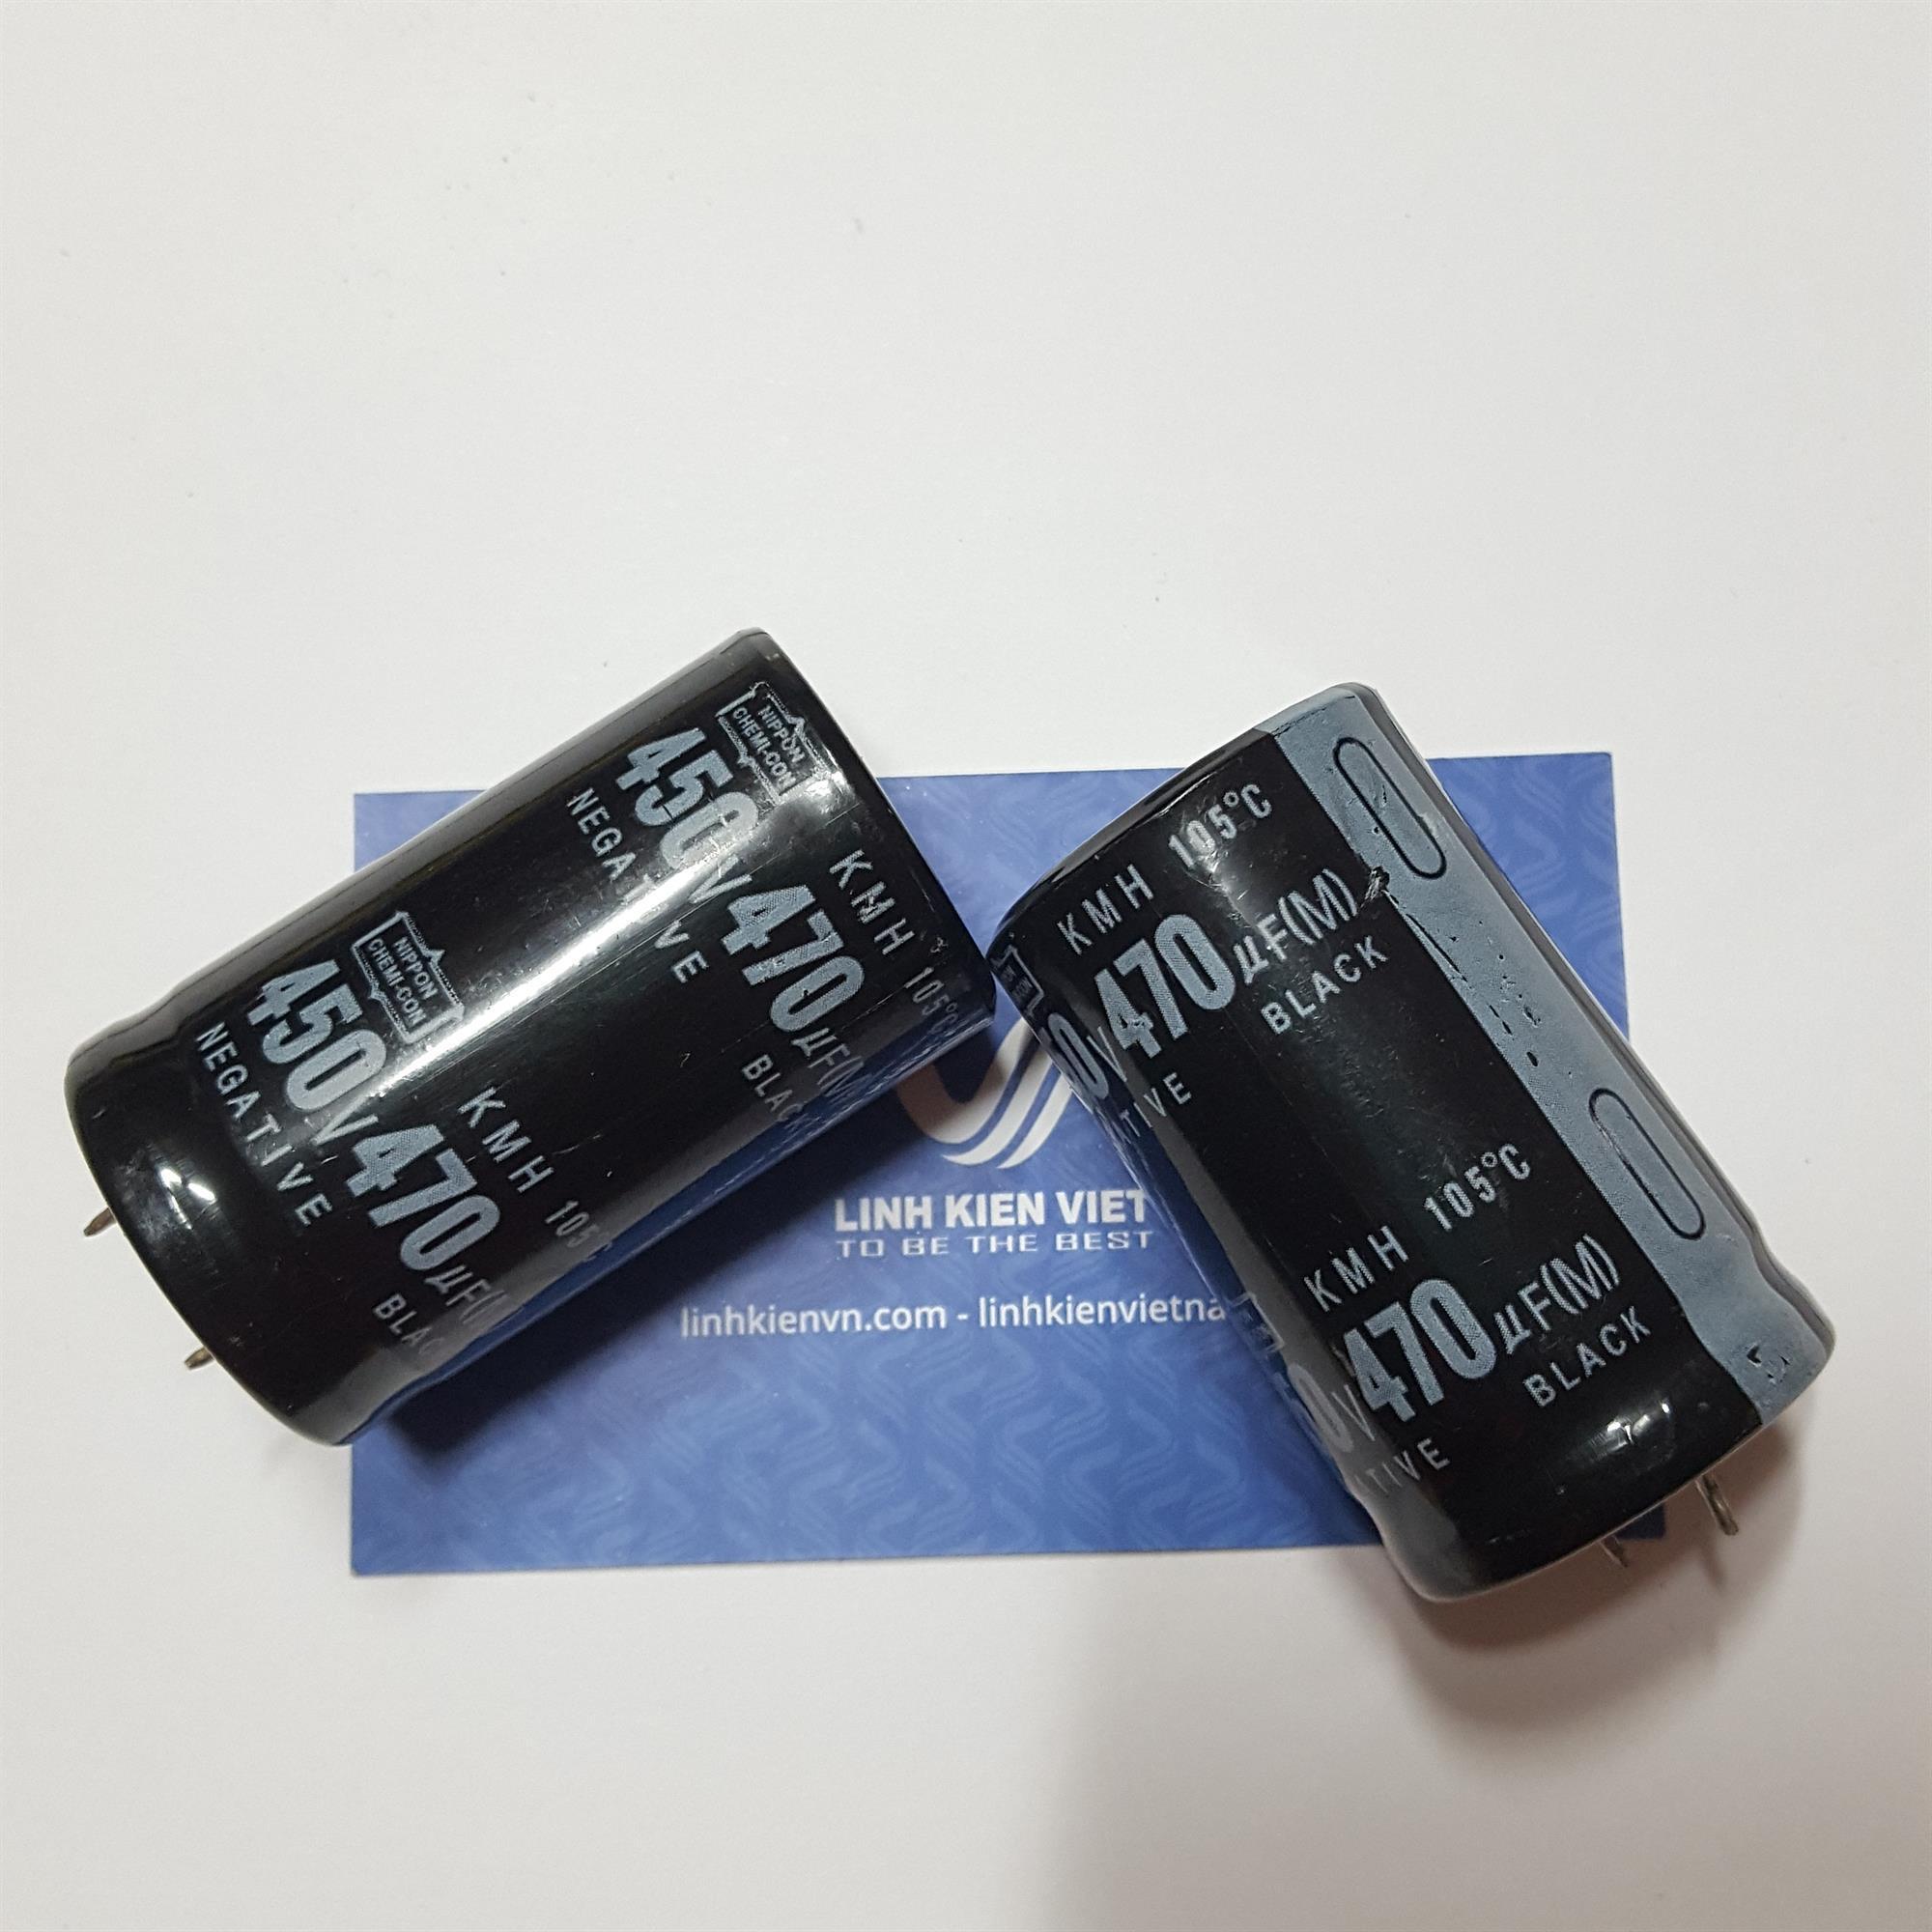 Tụ Hóa 470uF 450V - A7H15